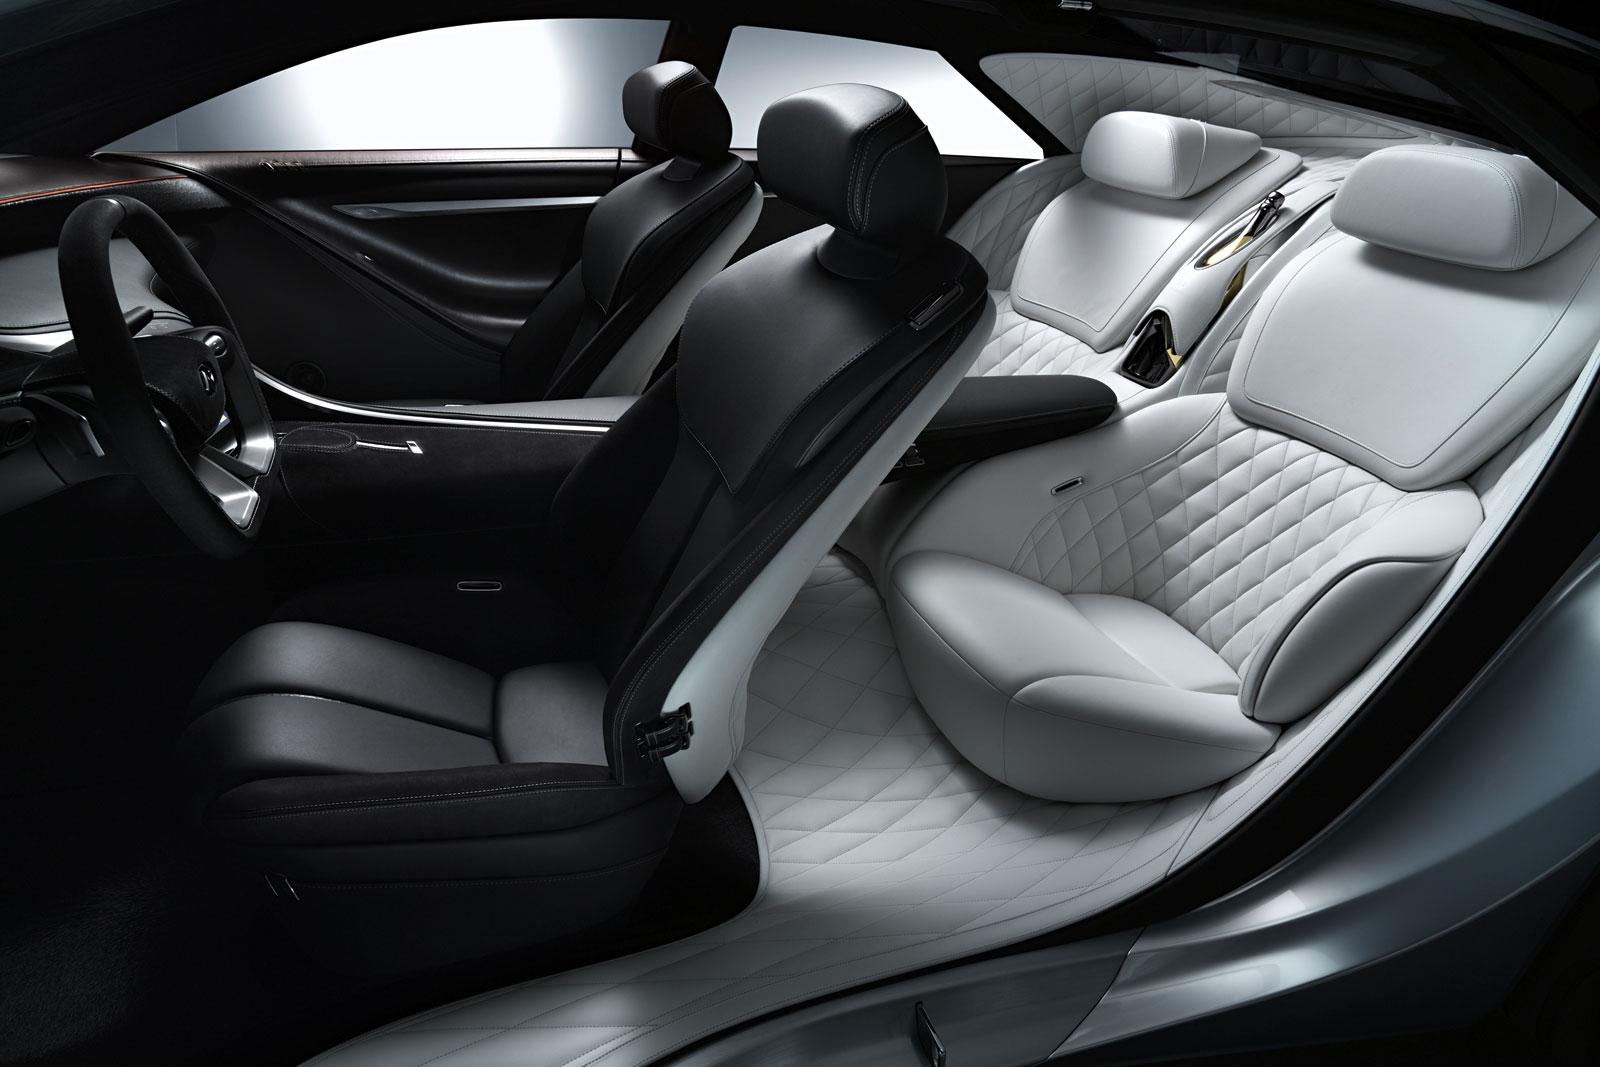 Infiniti q80 inspiration concept interior car body design for Inspiration concept interior design llc